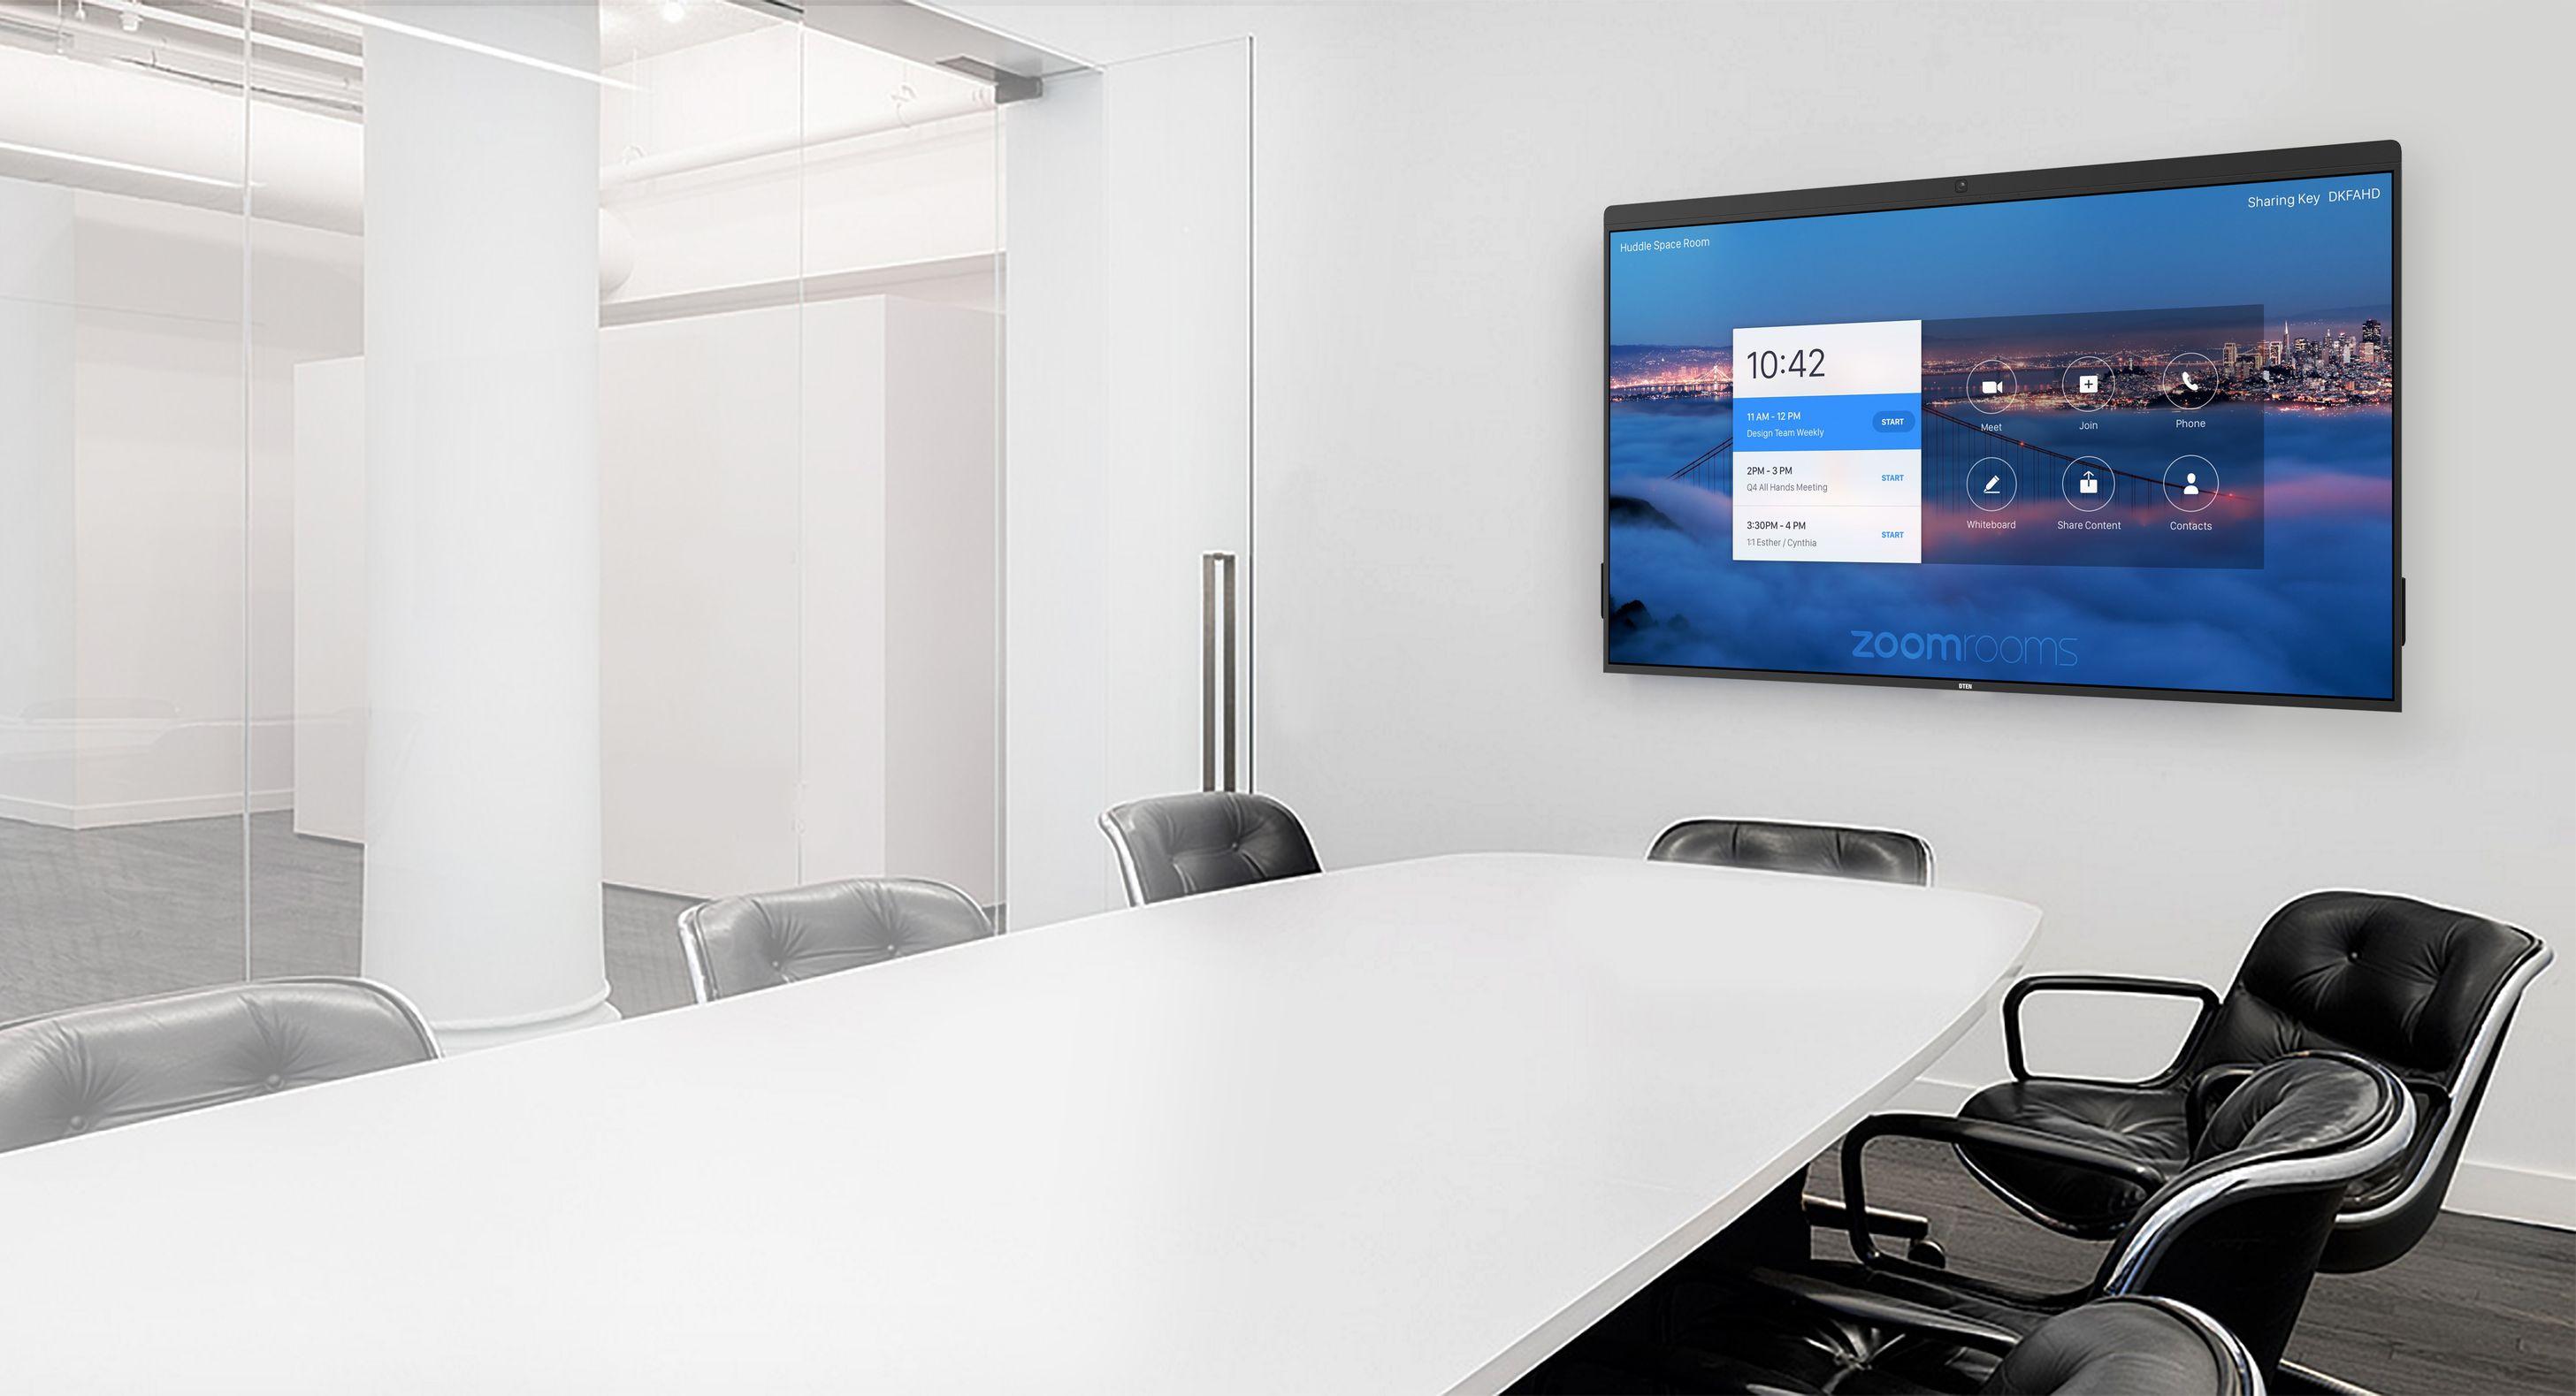 D7 Meeting Room